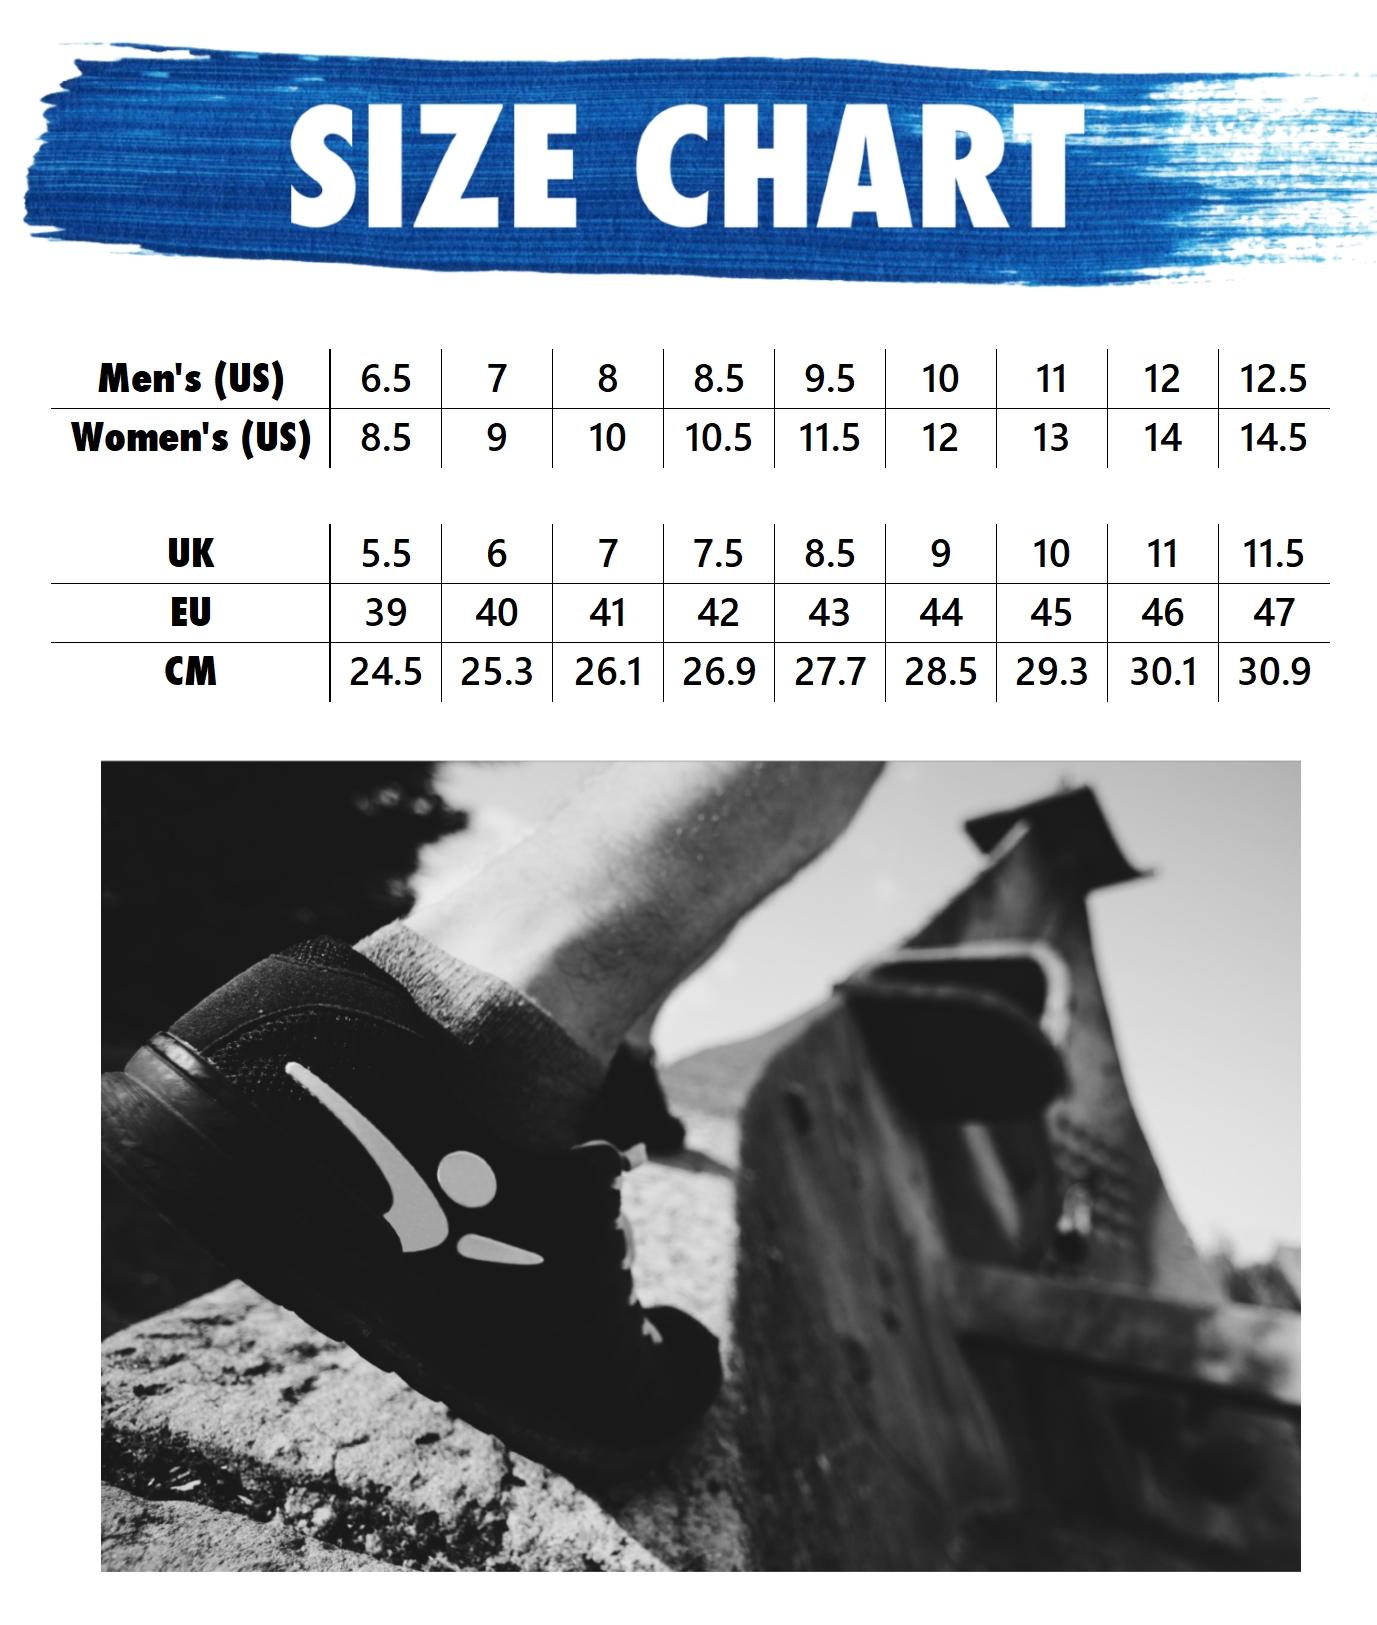 1.0-size-chart.jpg